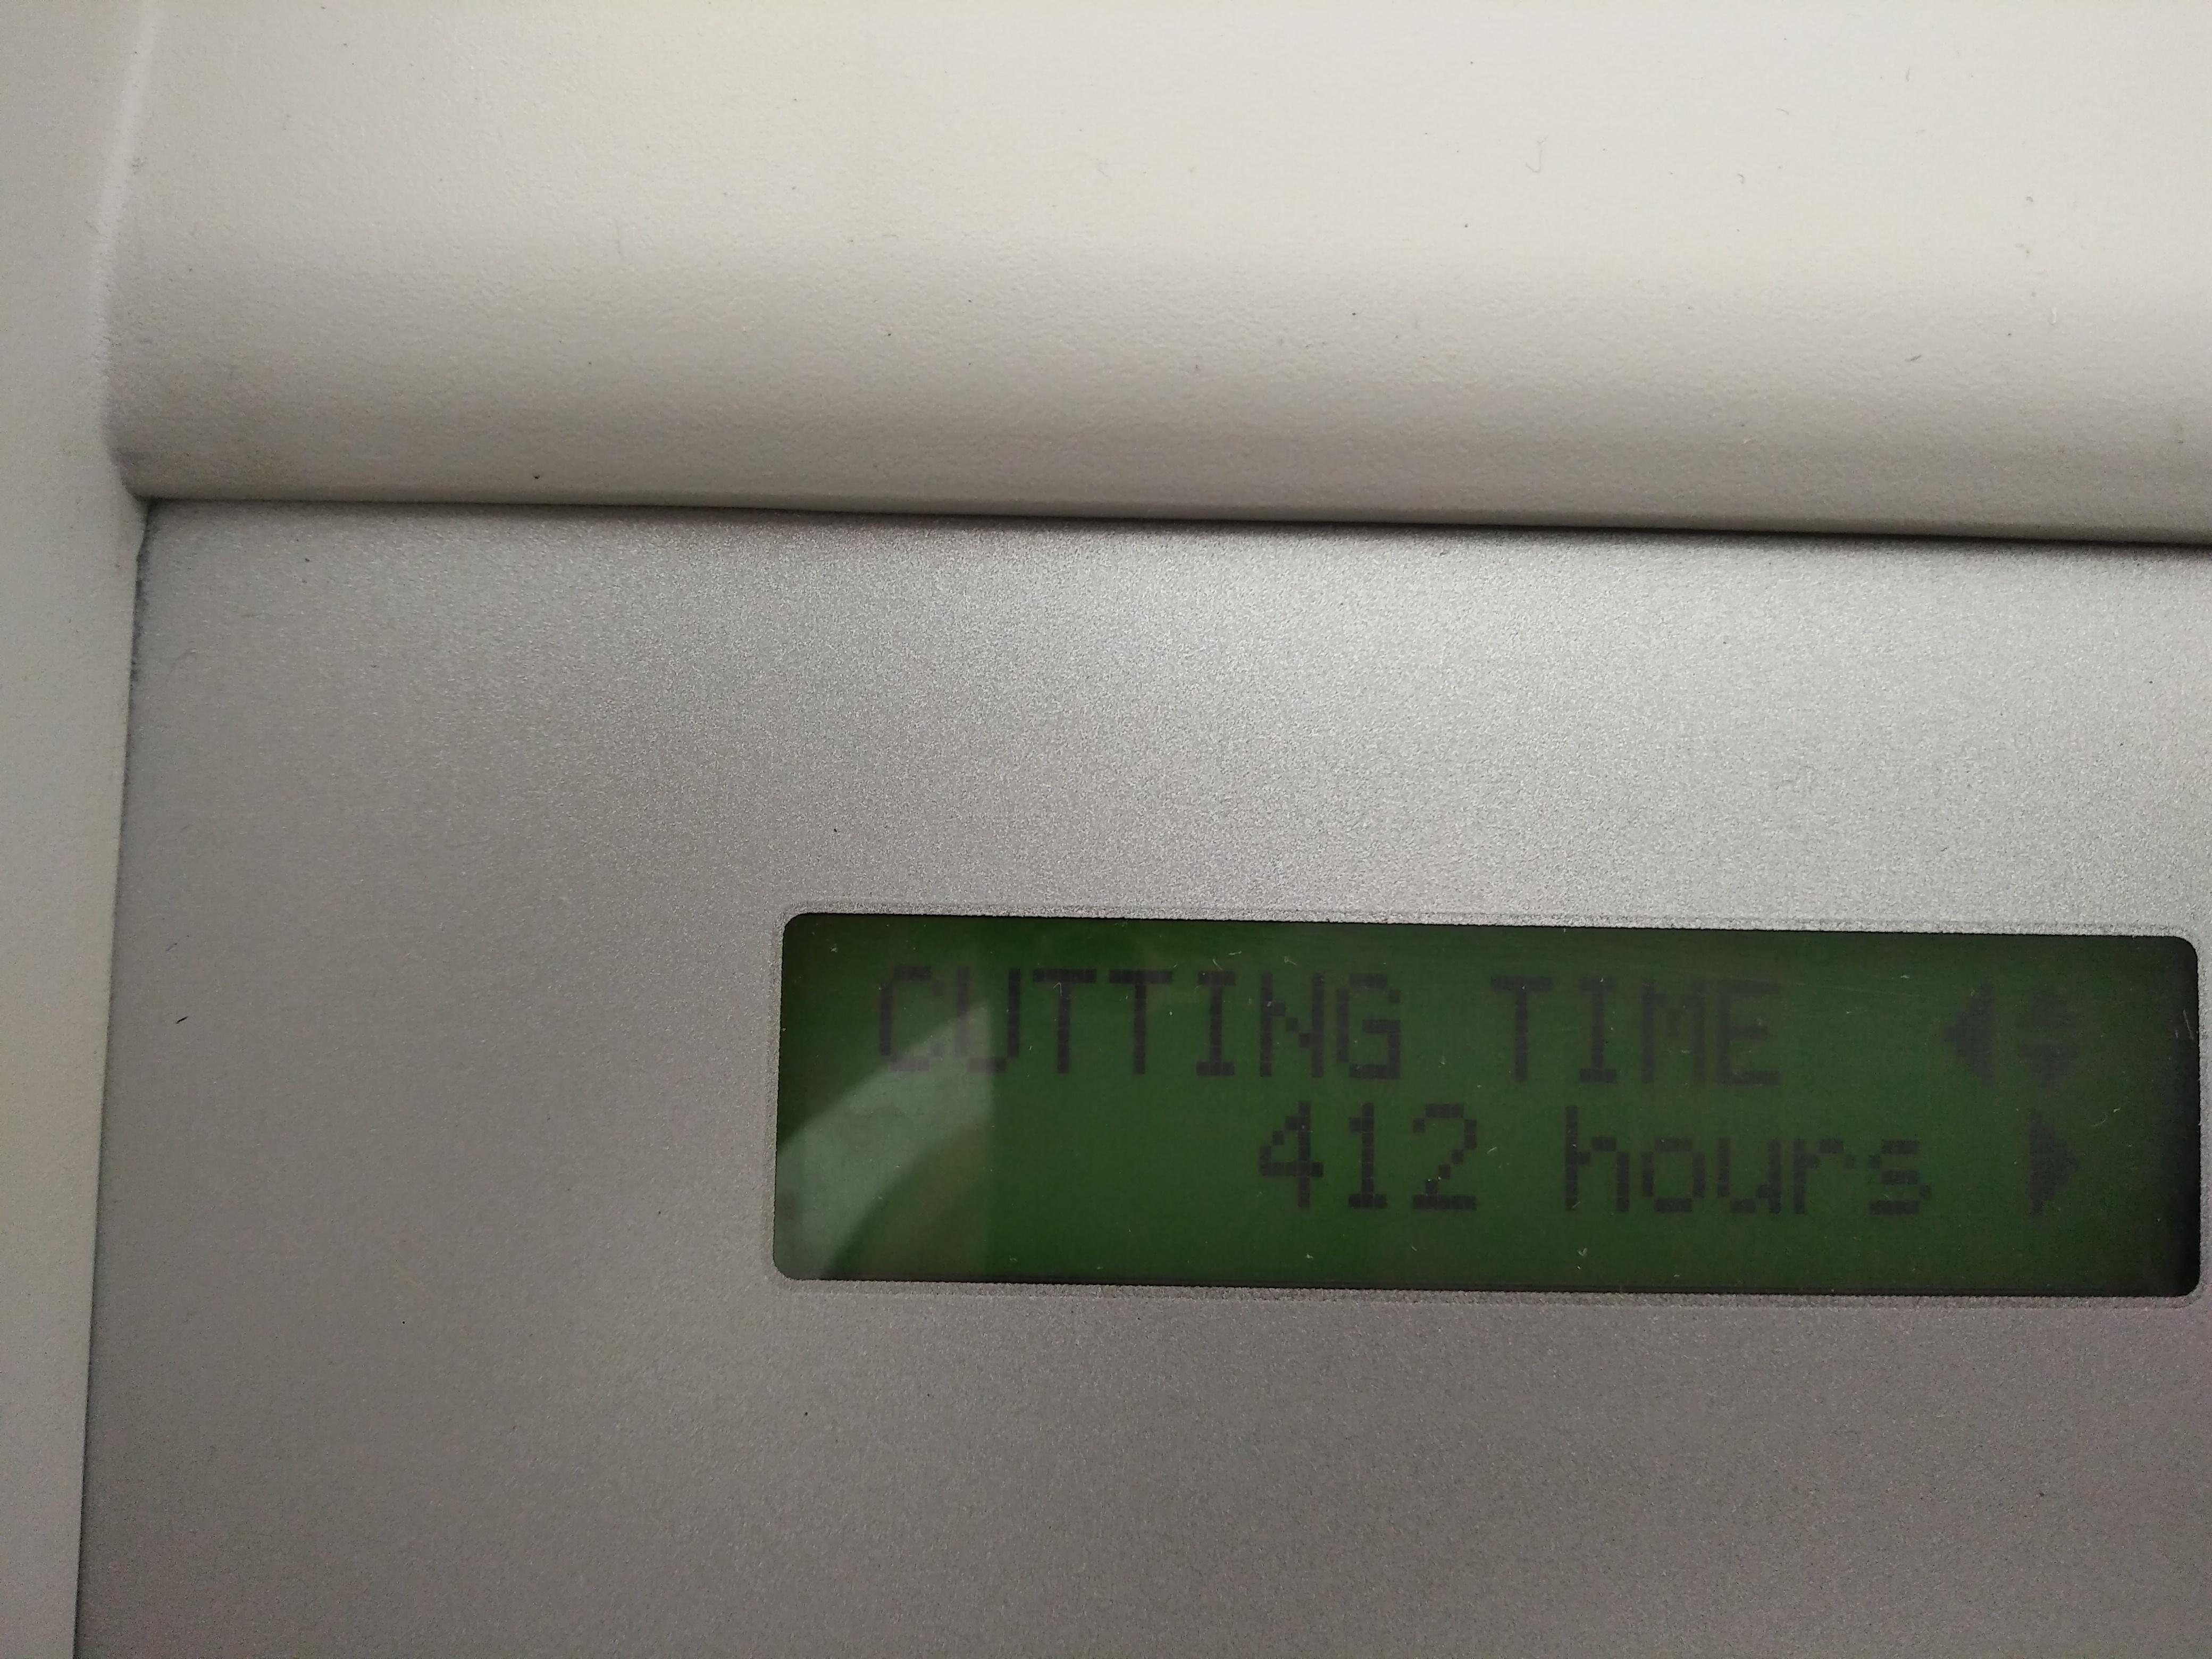 roland print and cut machine price